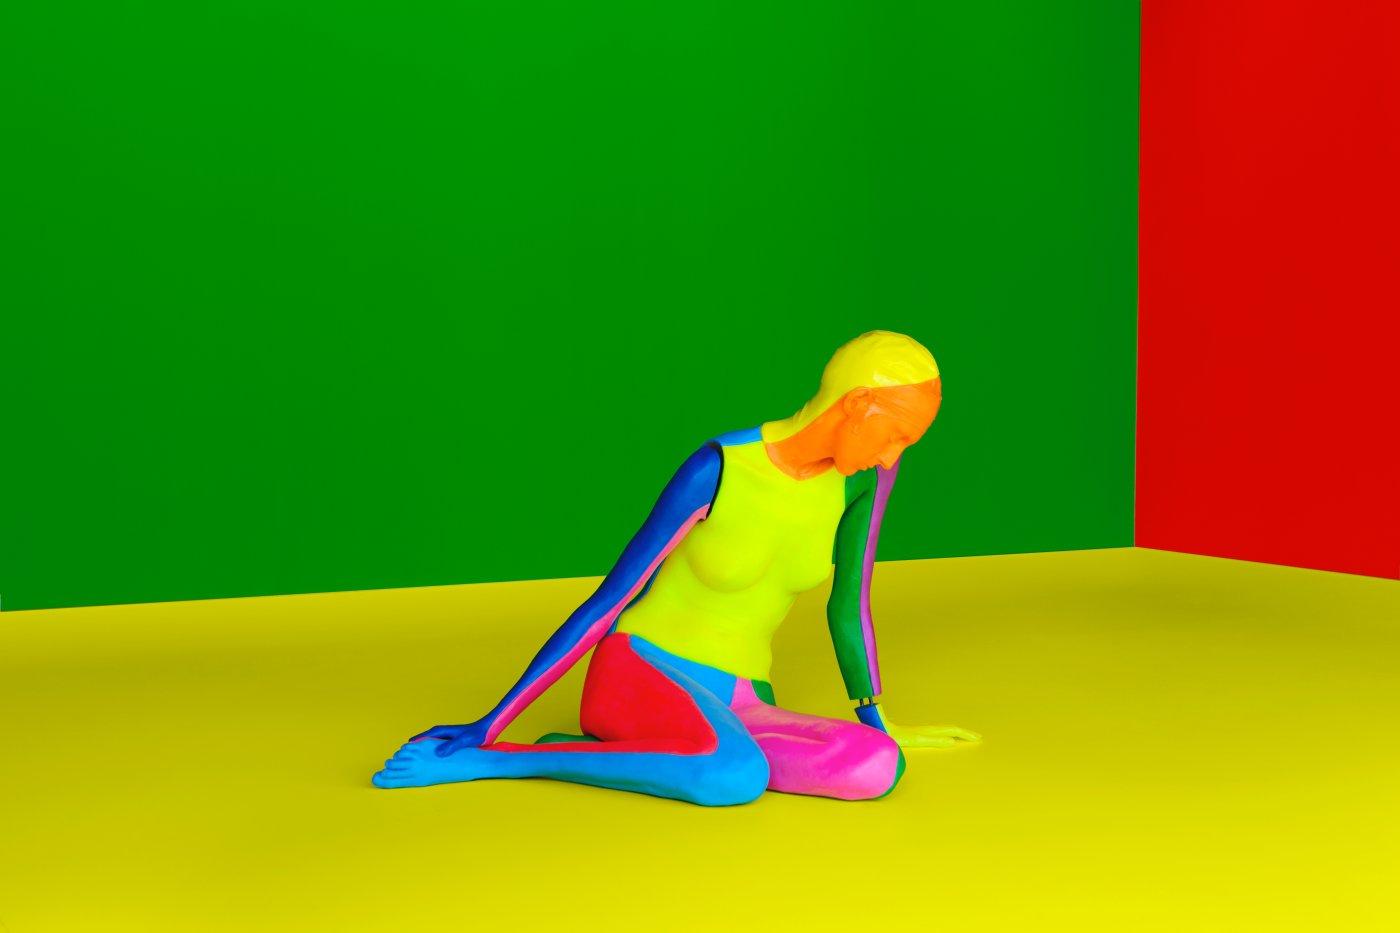 kamel mennour Ugo Rondinone a rainbow 6